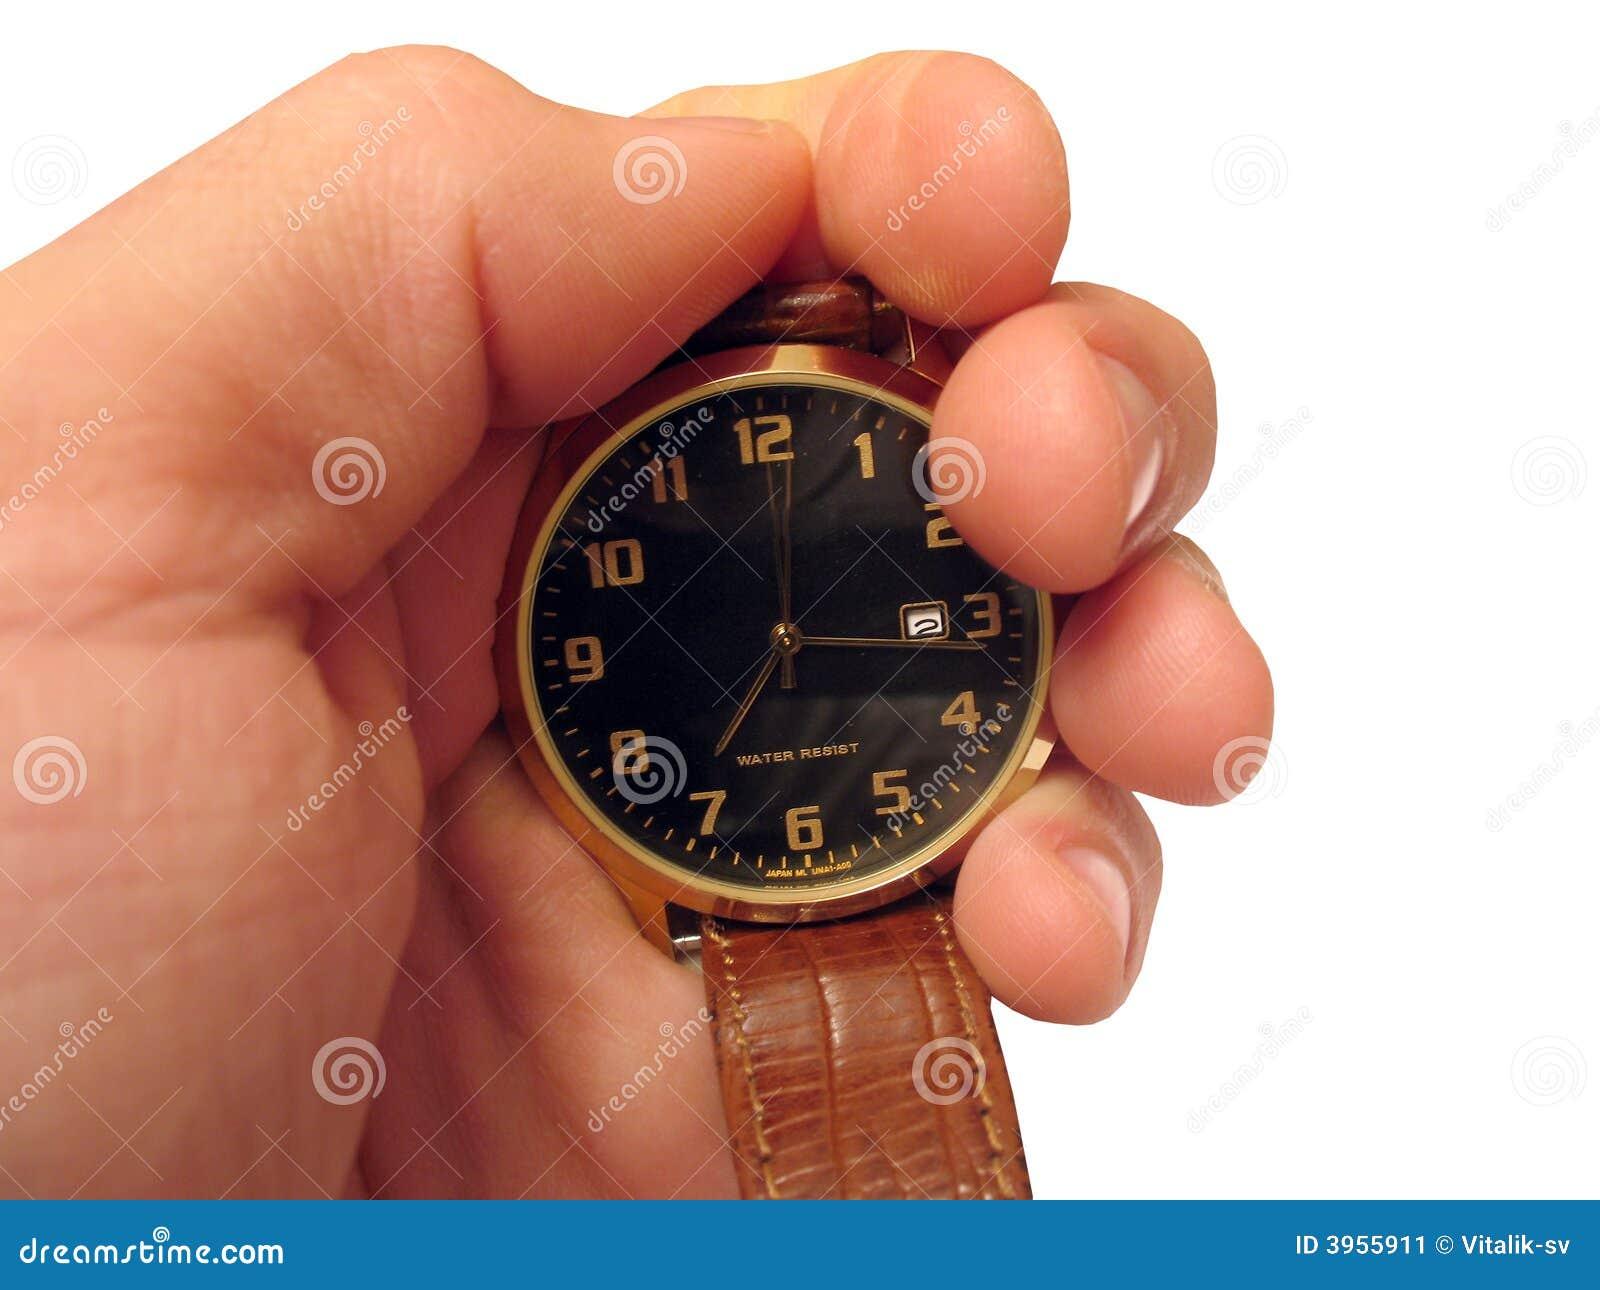 Wrist Watch On Hand Isolated Stock Image - Image: 3955911